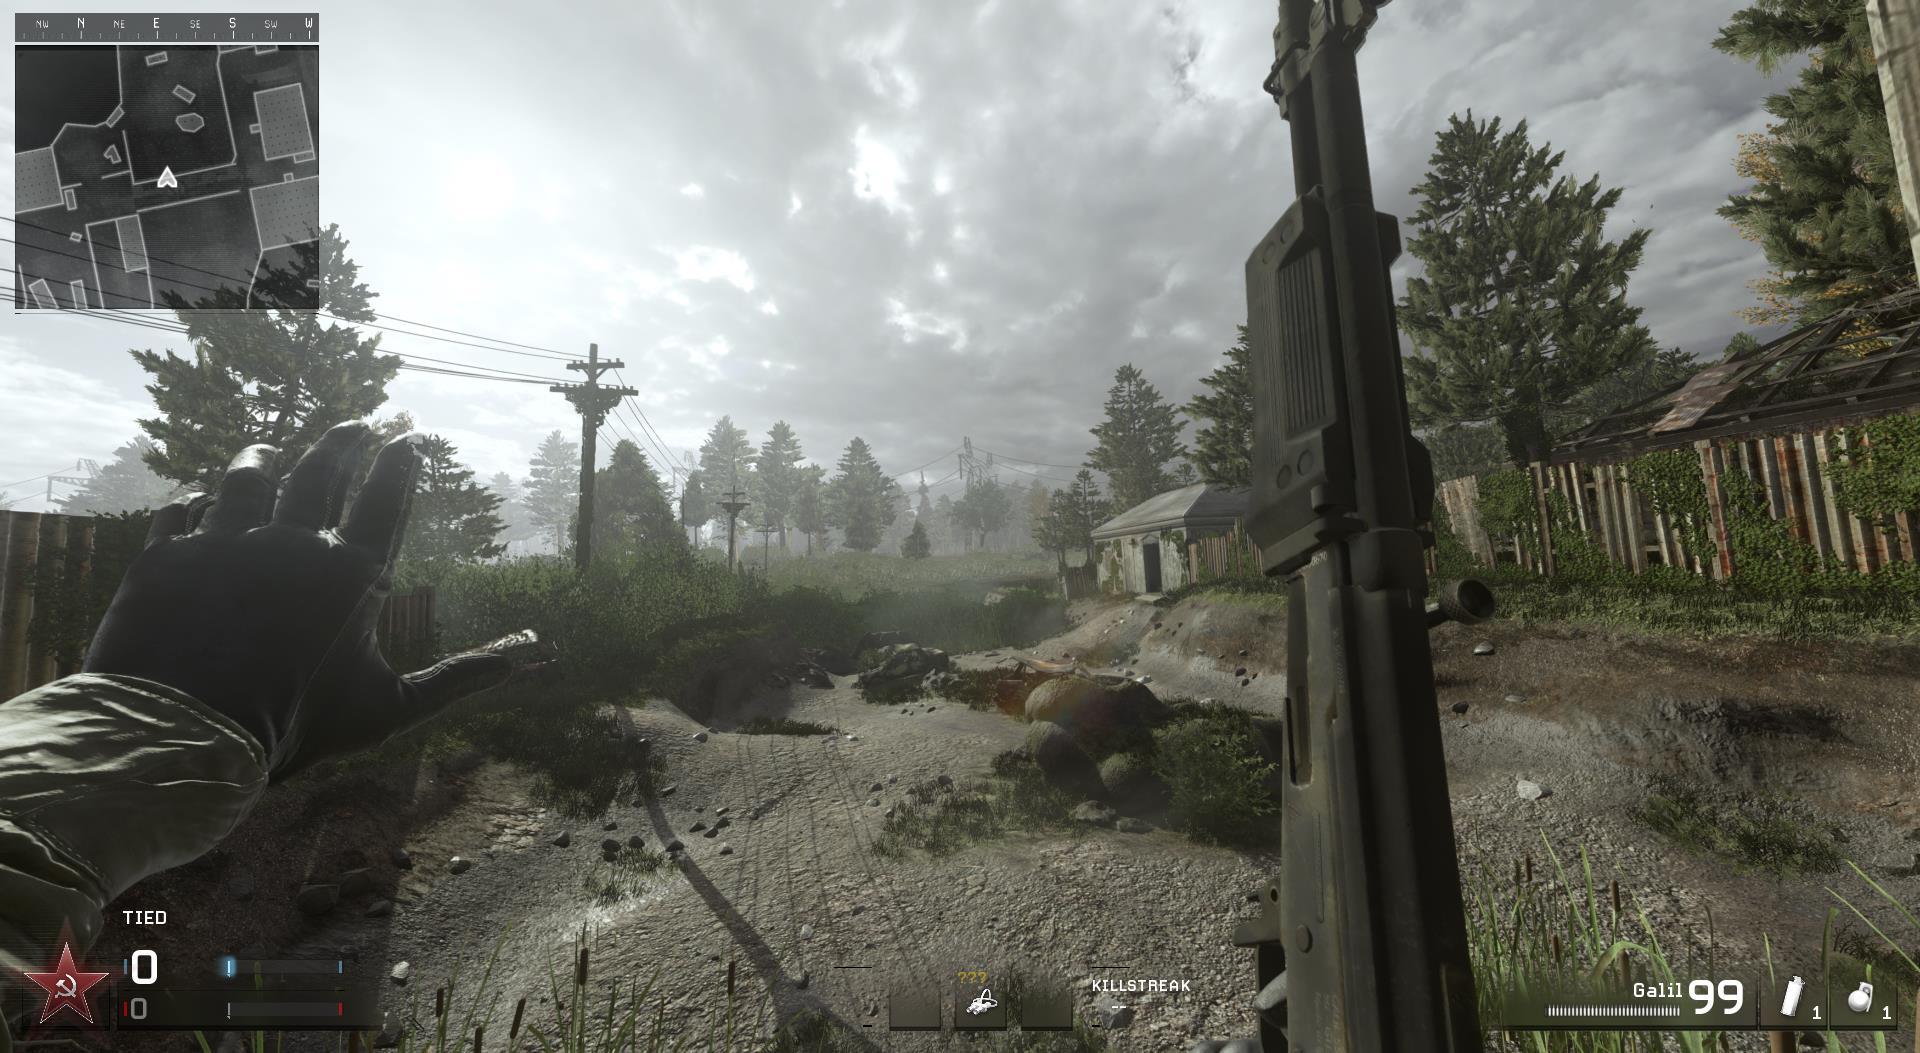 Call of Duty: Modern Warfare Remastered has plenty of hidden weapons